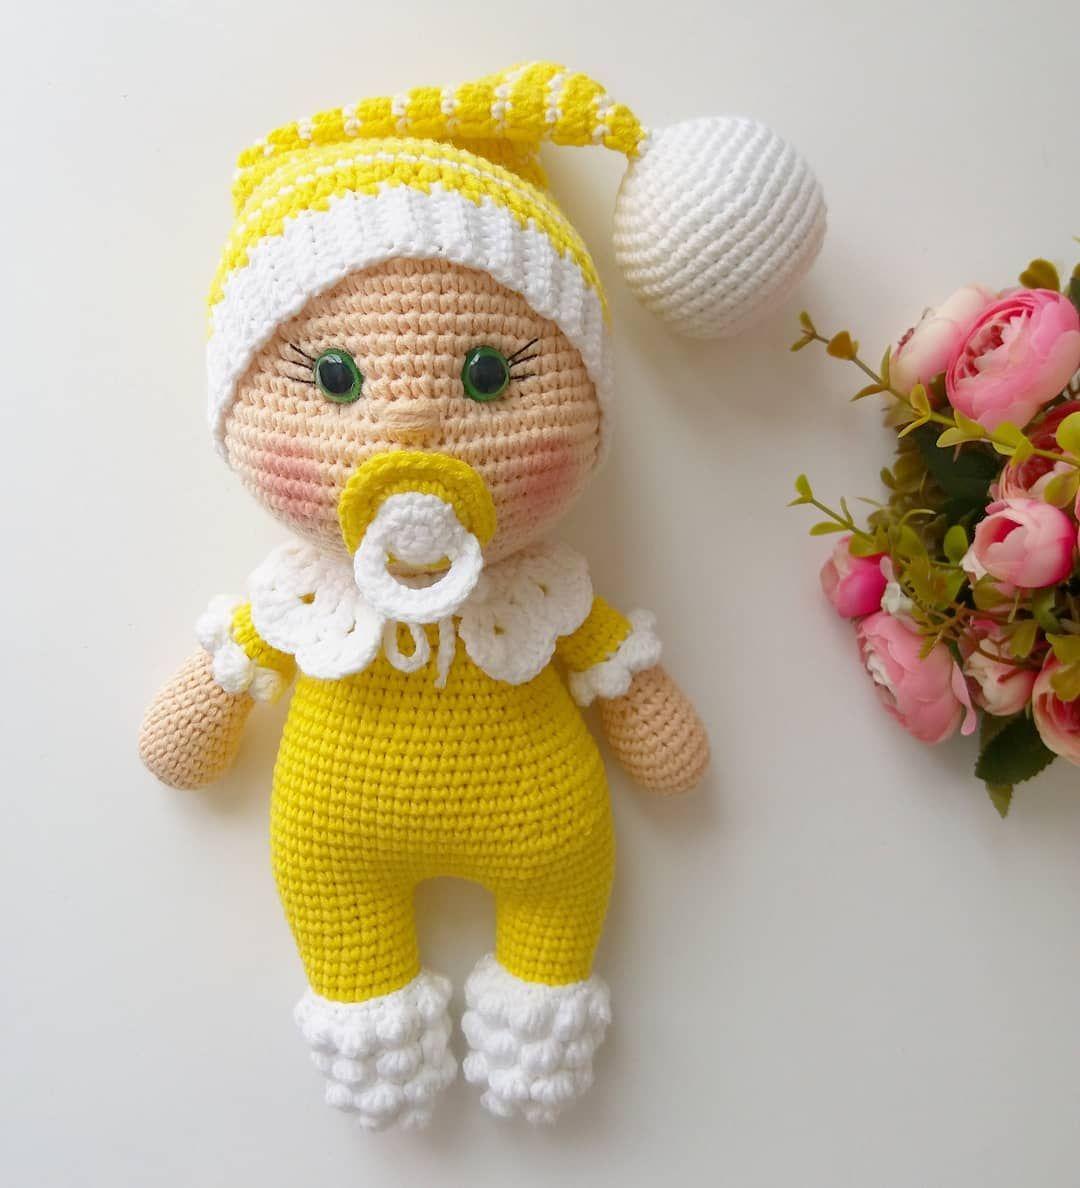 Amigurumi Doll Pacifier Baby Free Crochet Pattern | Amigurumi doll, Crochet  dolls free patterns, Crochet doll pattern | 1188x1080